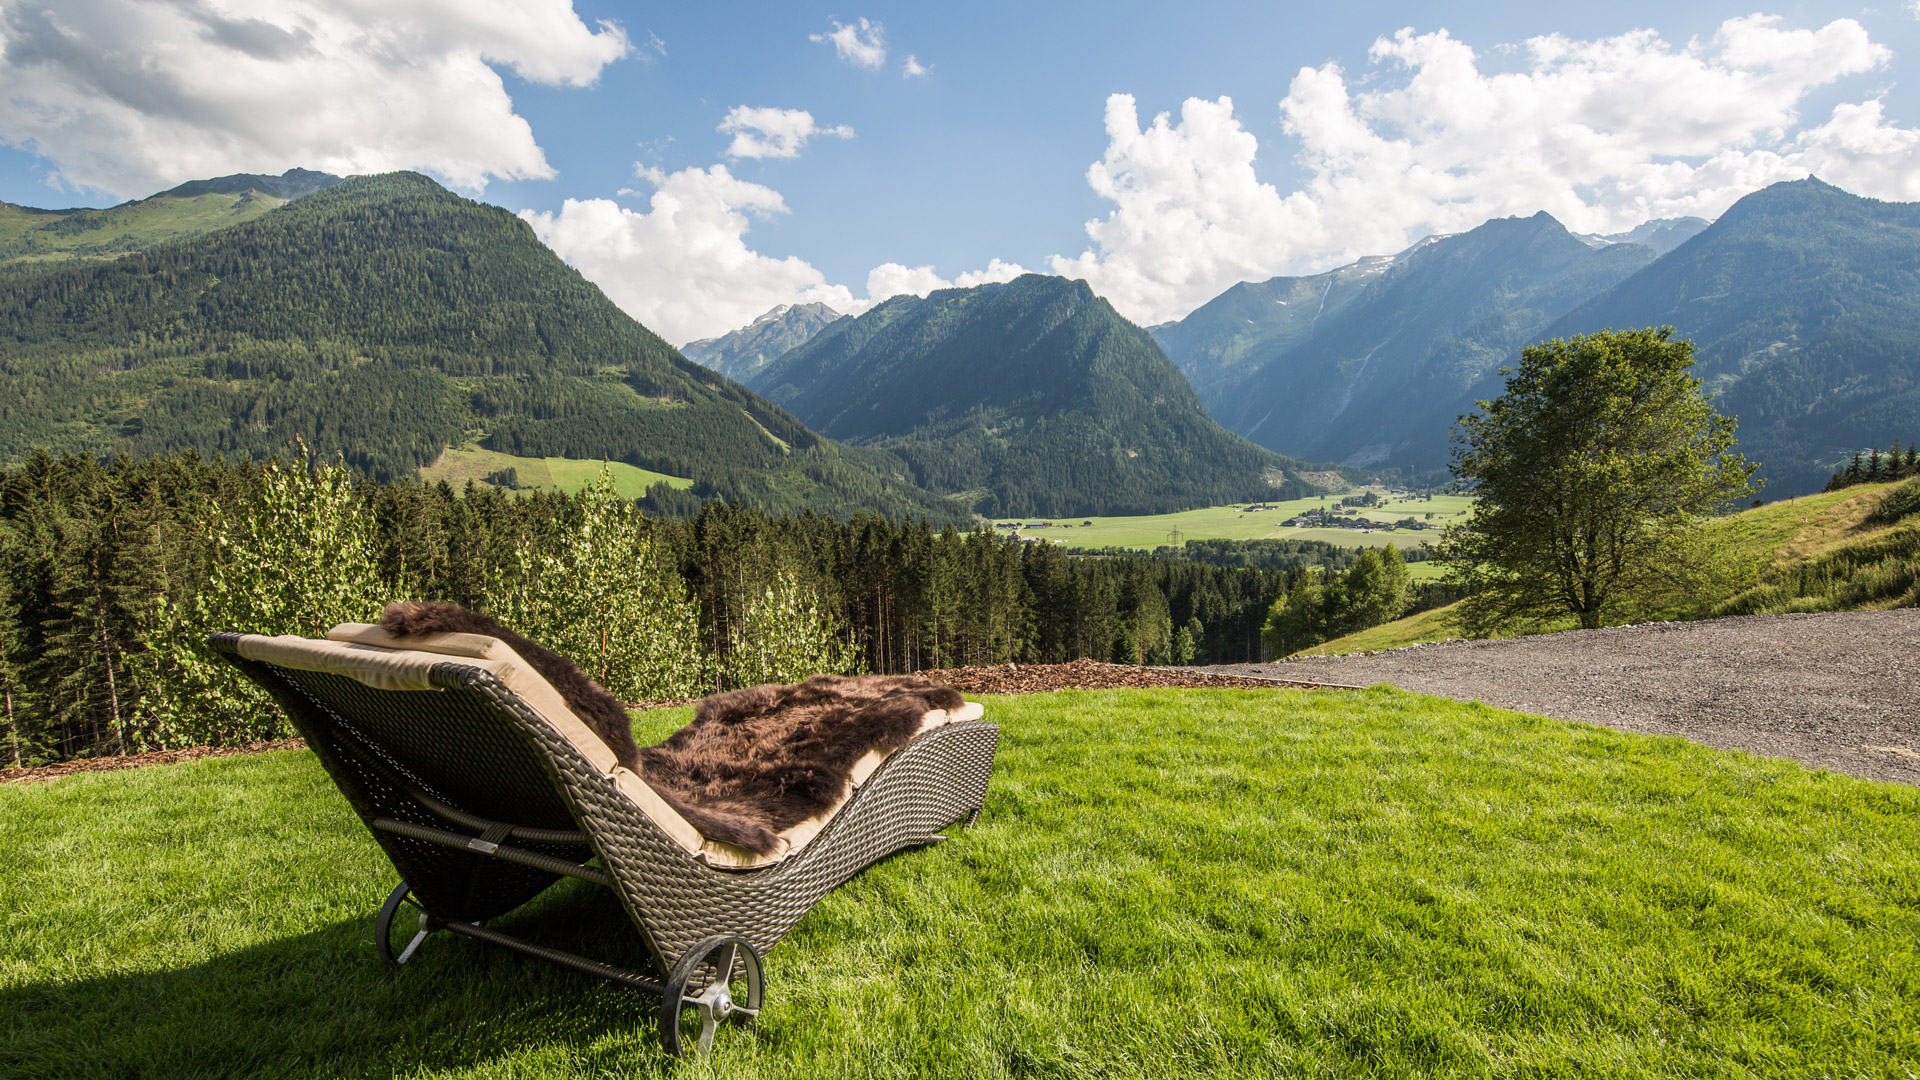 Forest Village Chalets Chalet, Austria